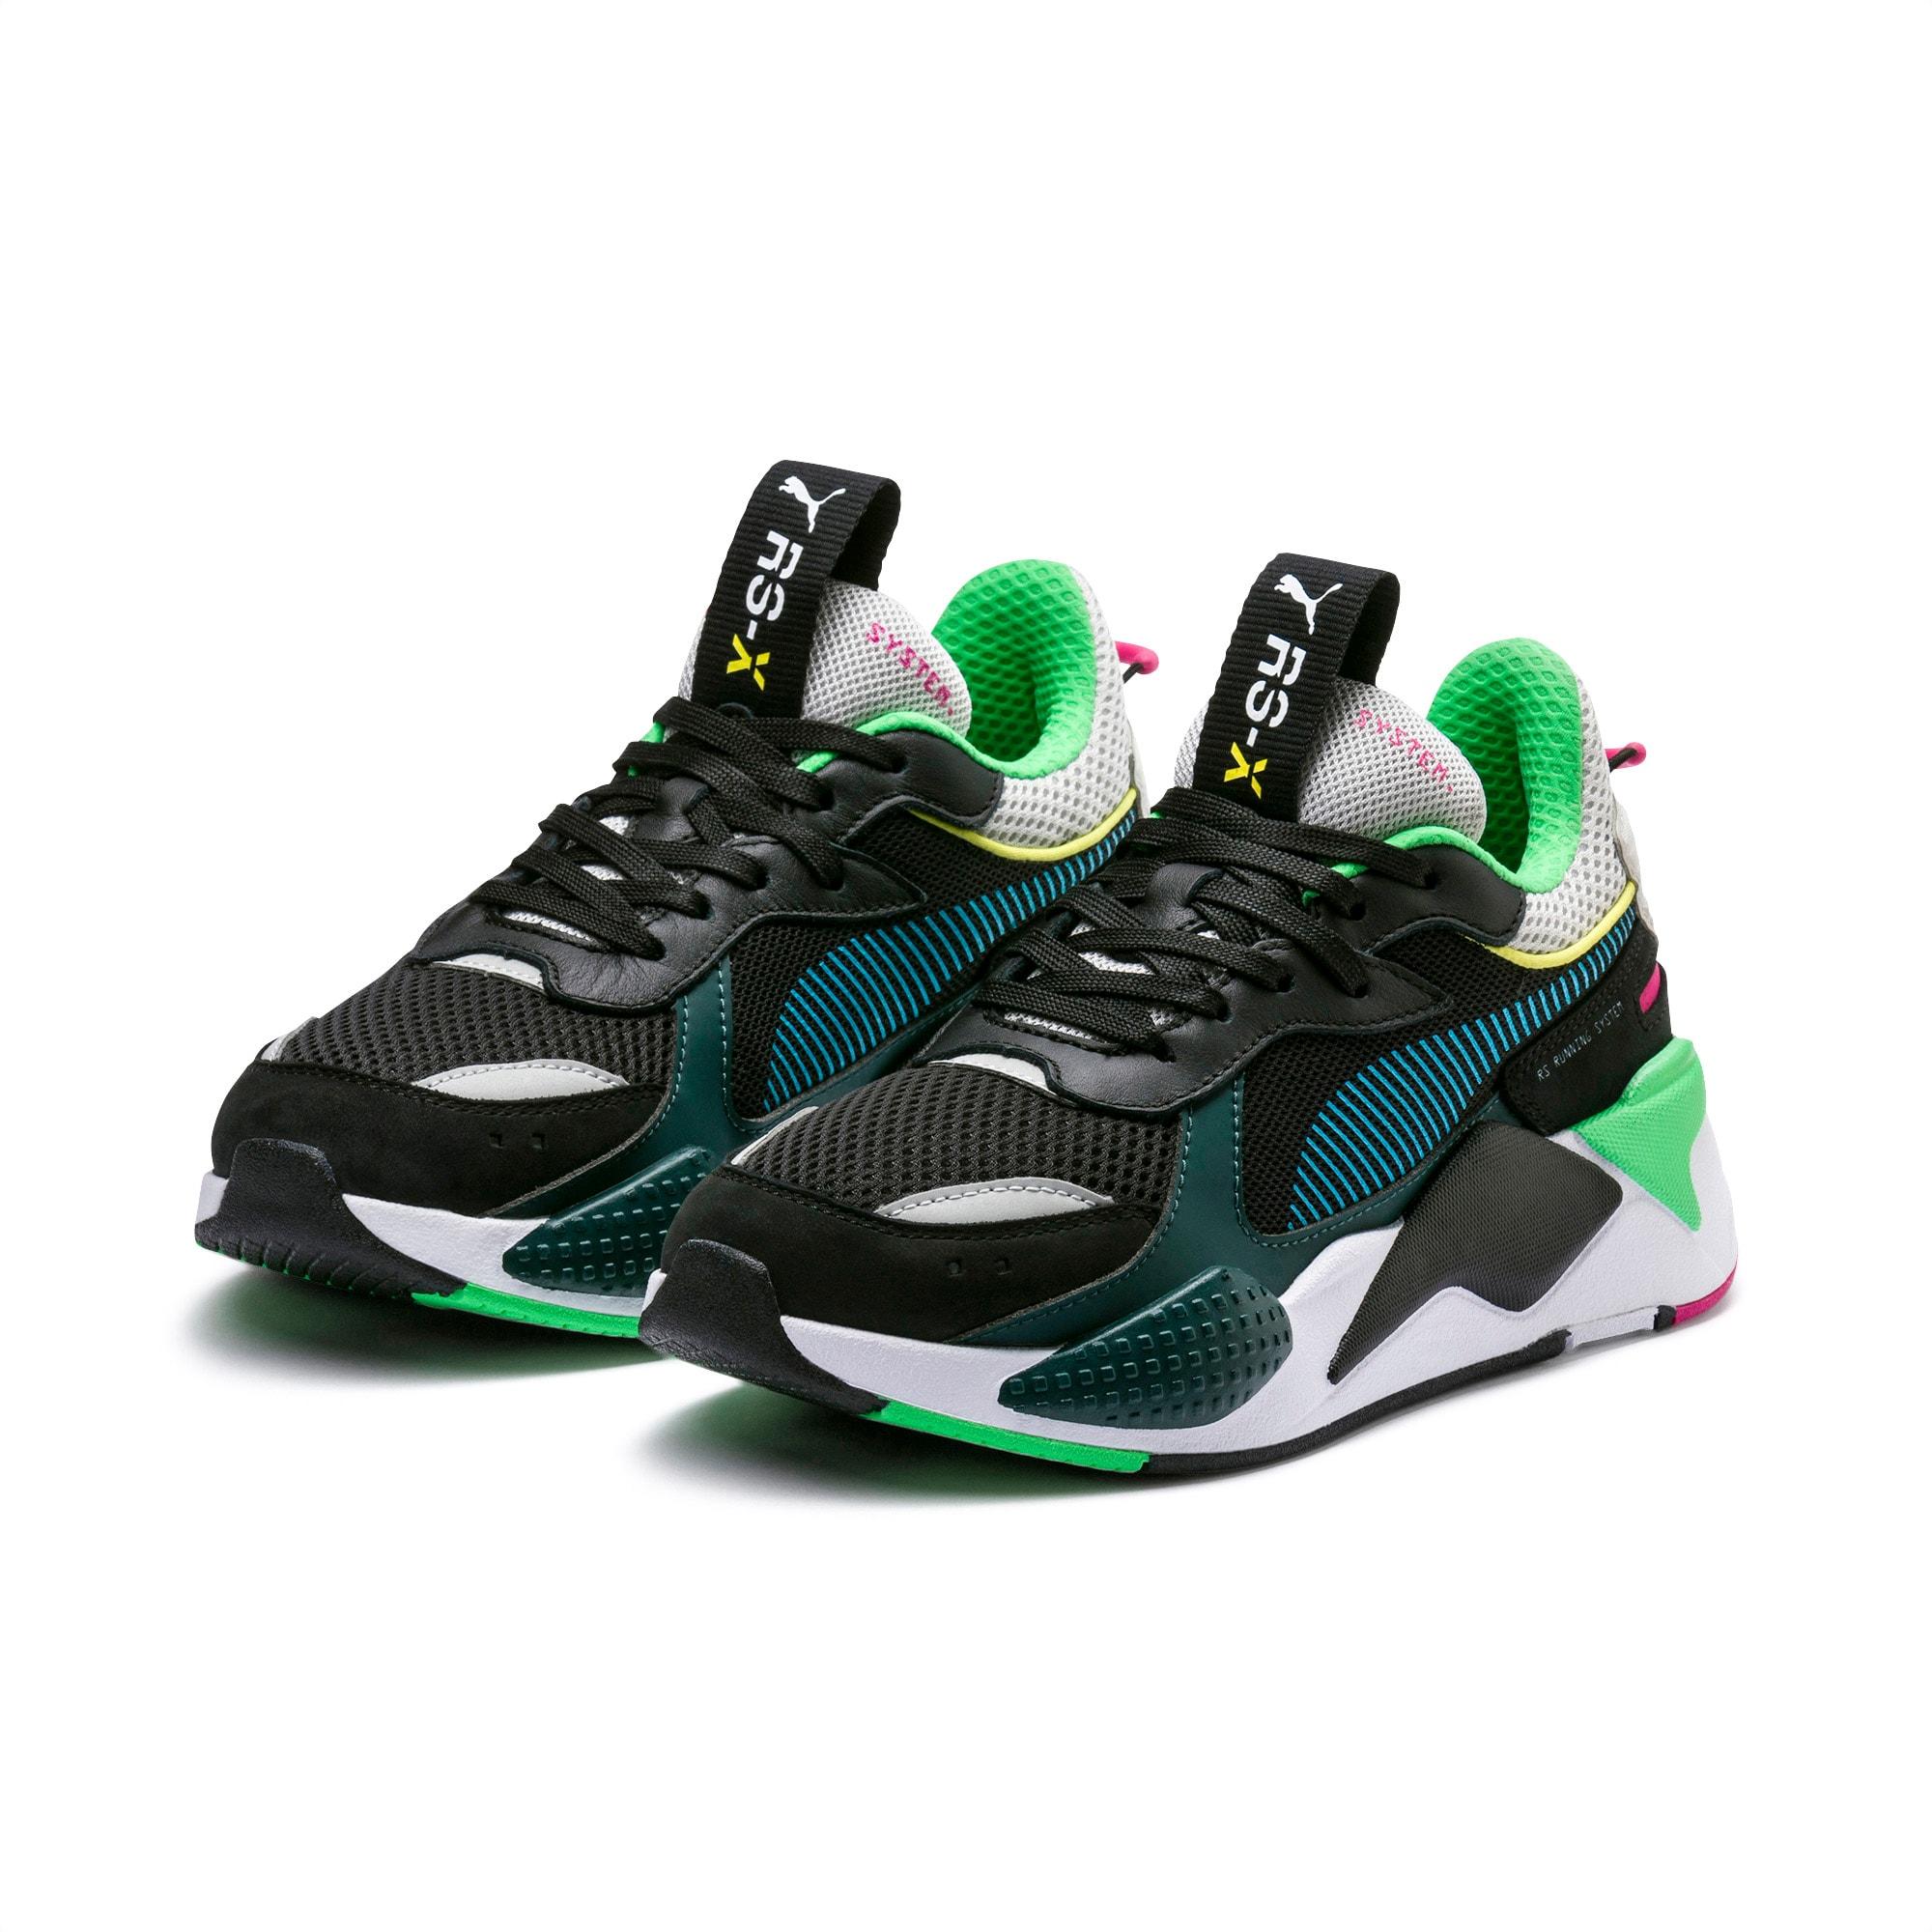 Telégrafo su tonto  RS-X Toys Men's Sneakers | PUMA US